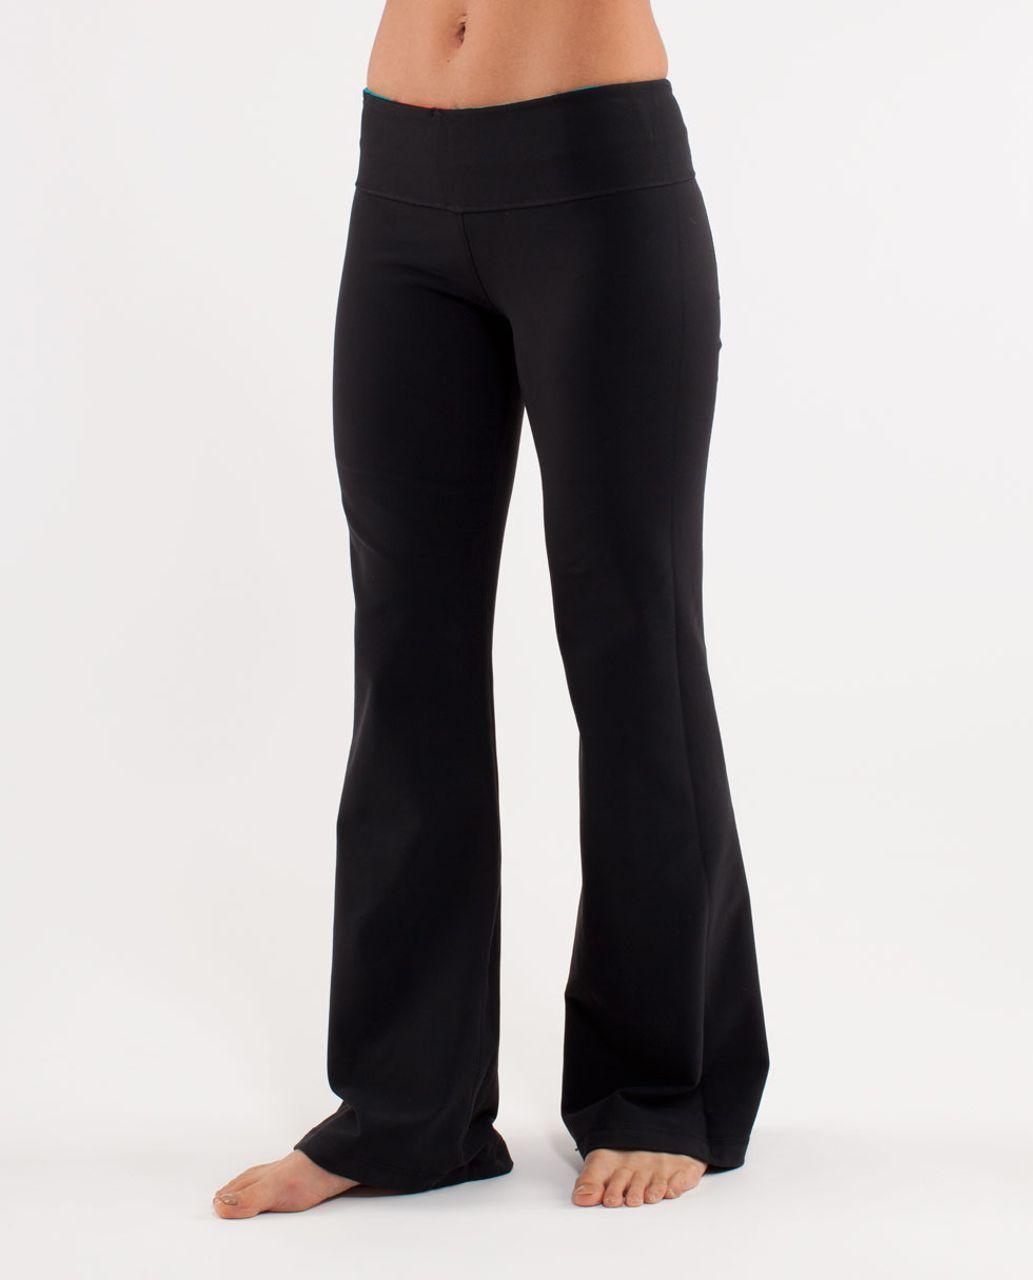 Lululemon Groove Pant (Regular) - Black /  Quilt Fall 1